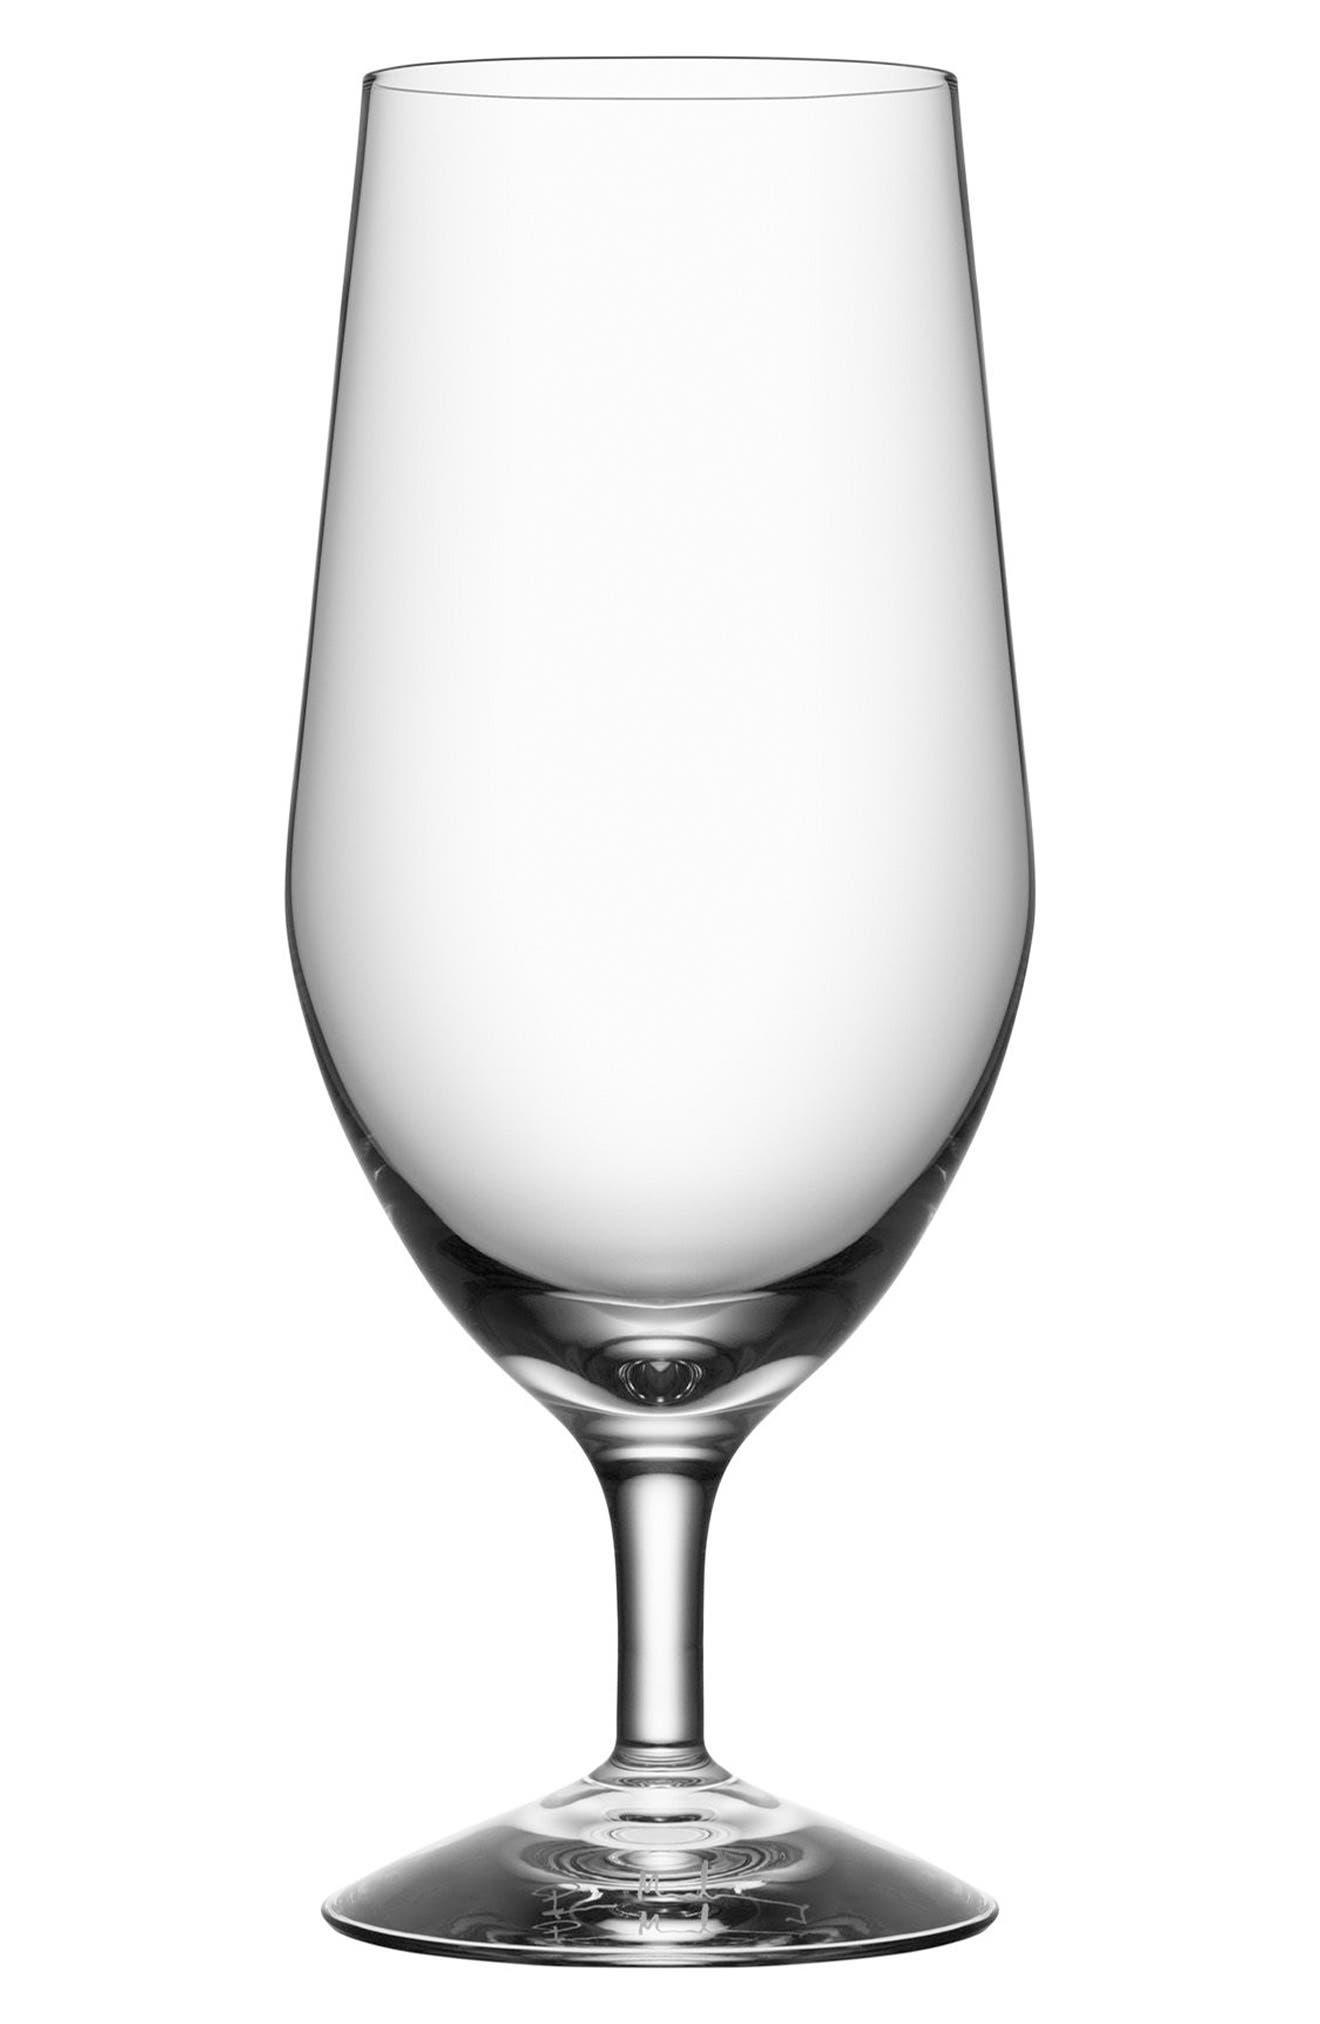 Orrefors Morberg Collection Set of 4 Crystal Beer Glasses